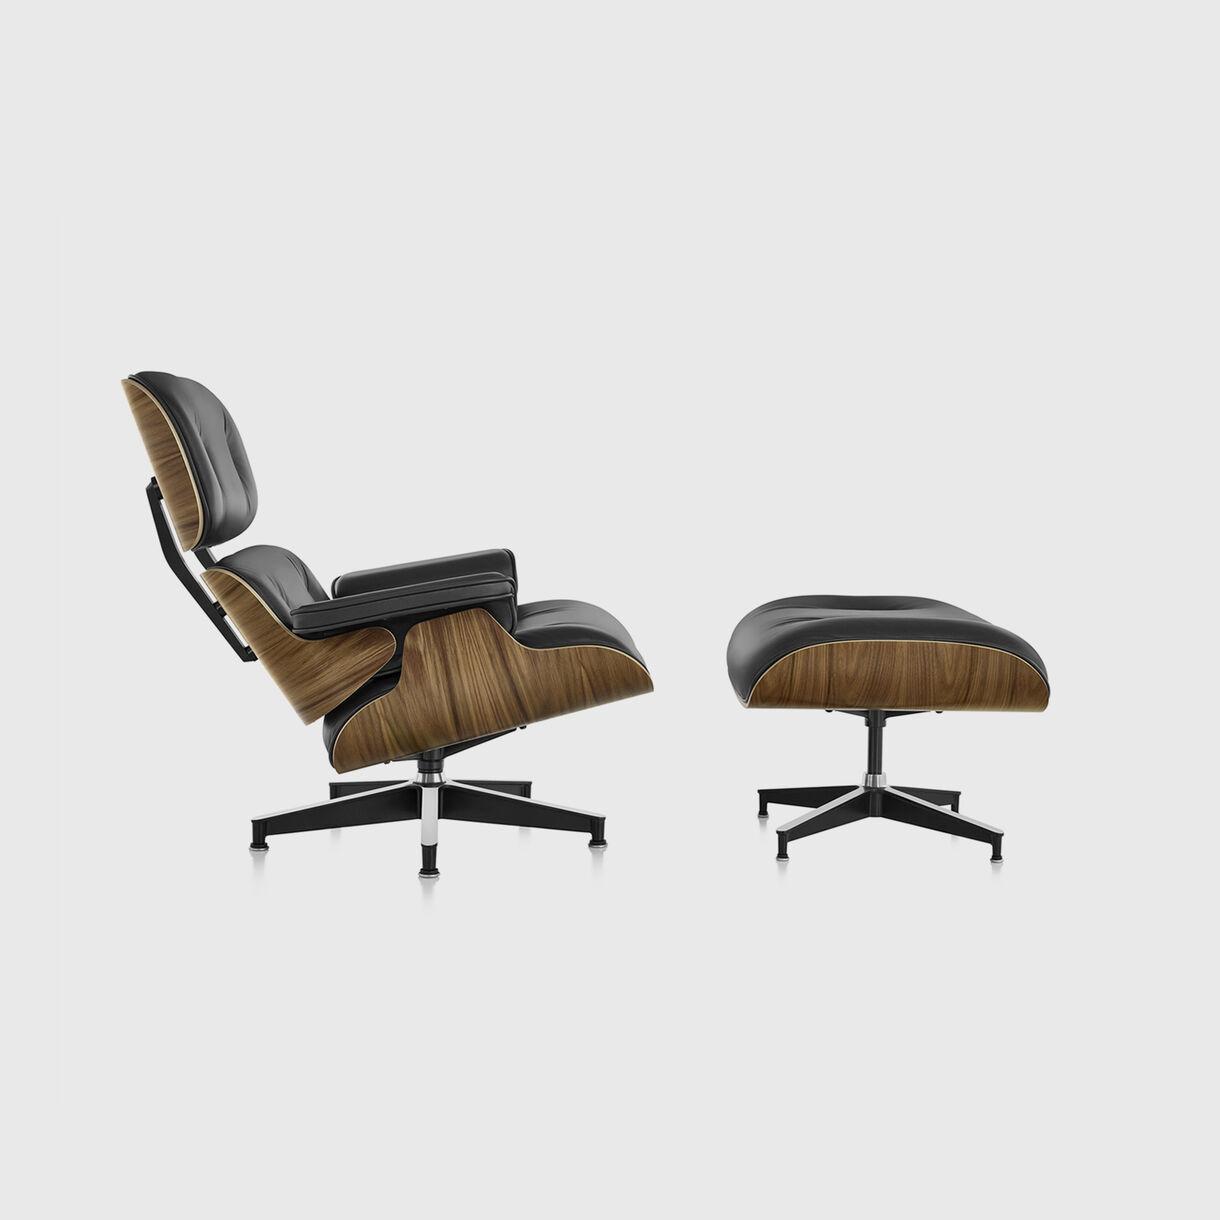 Eames Lounge Chair & Ottoman, Walnut & Black, Side